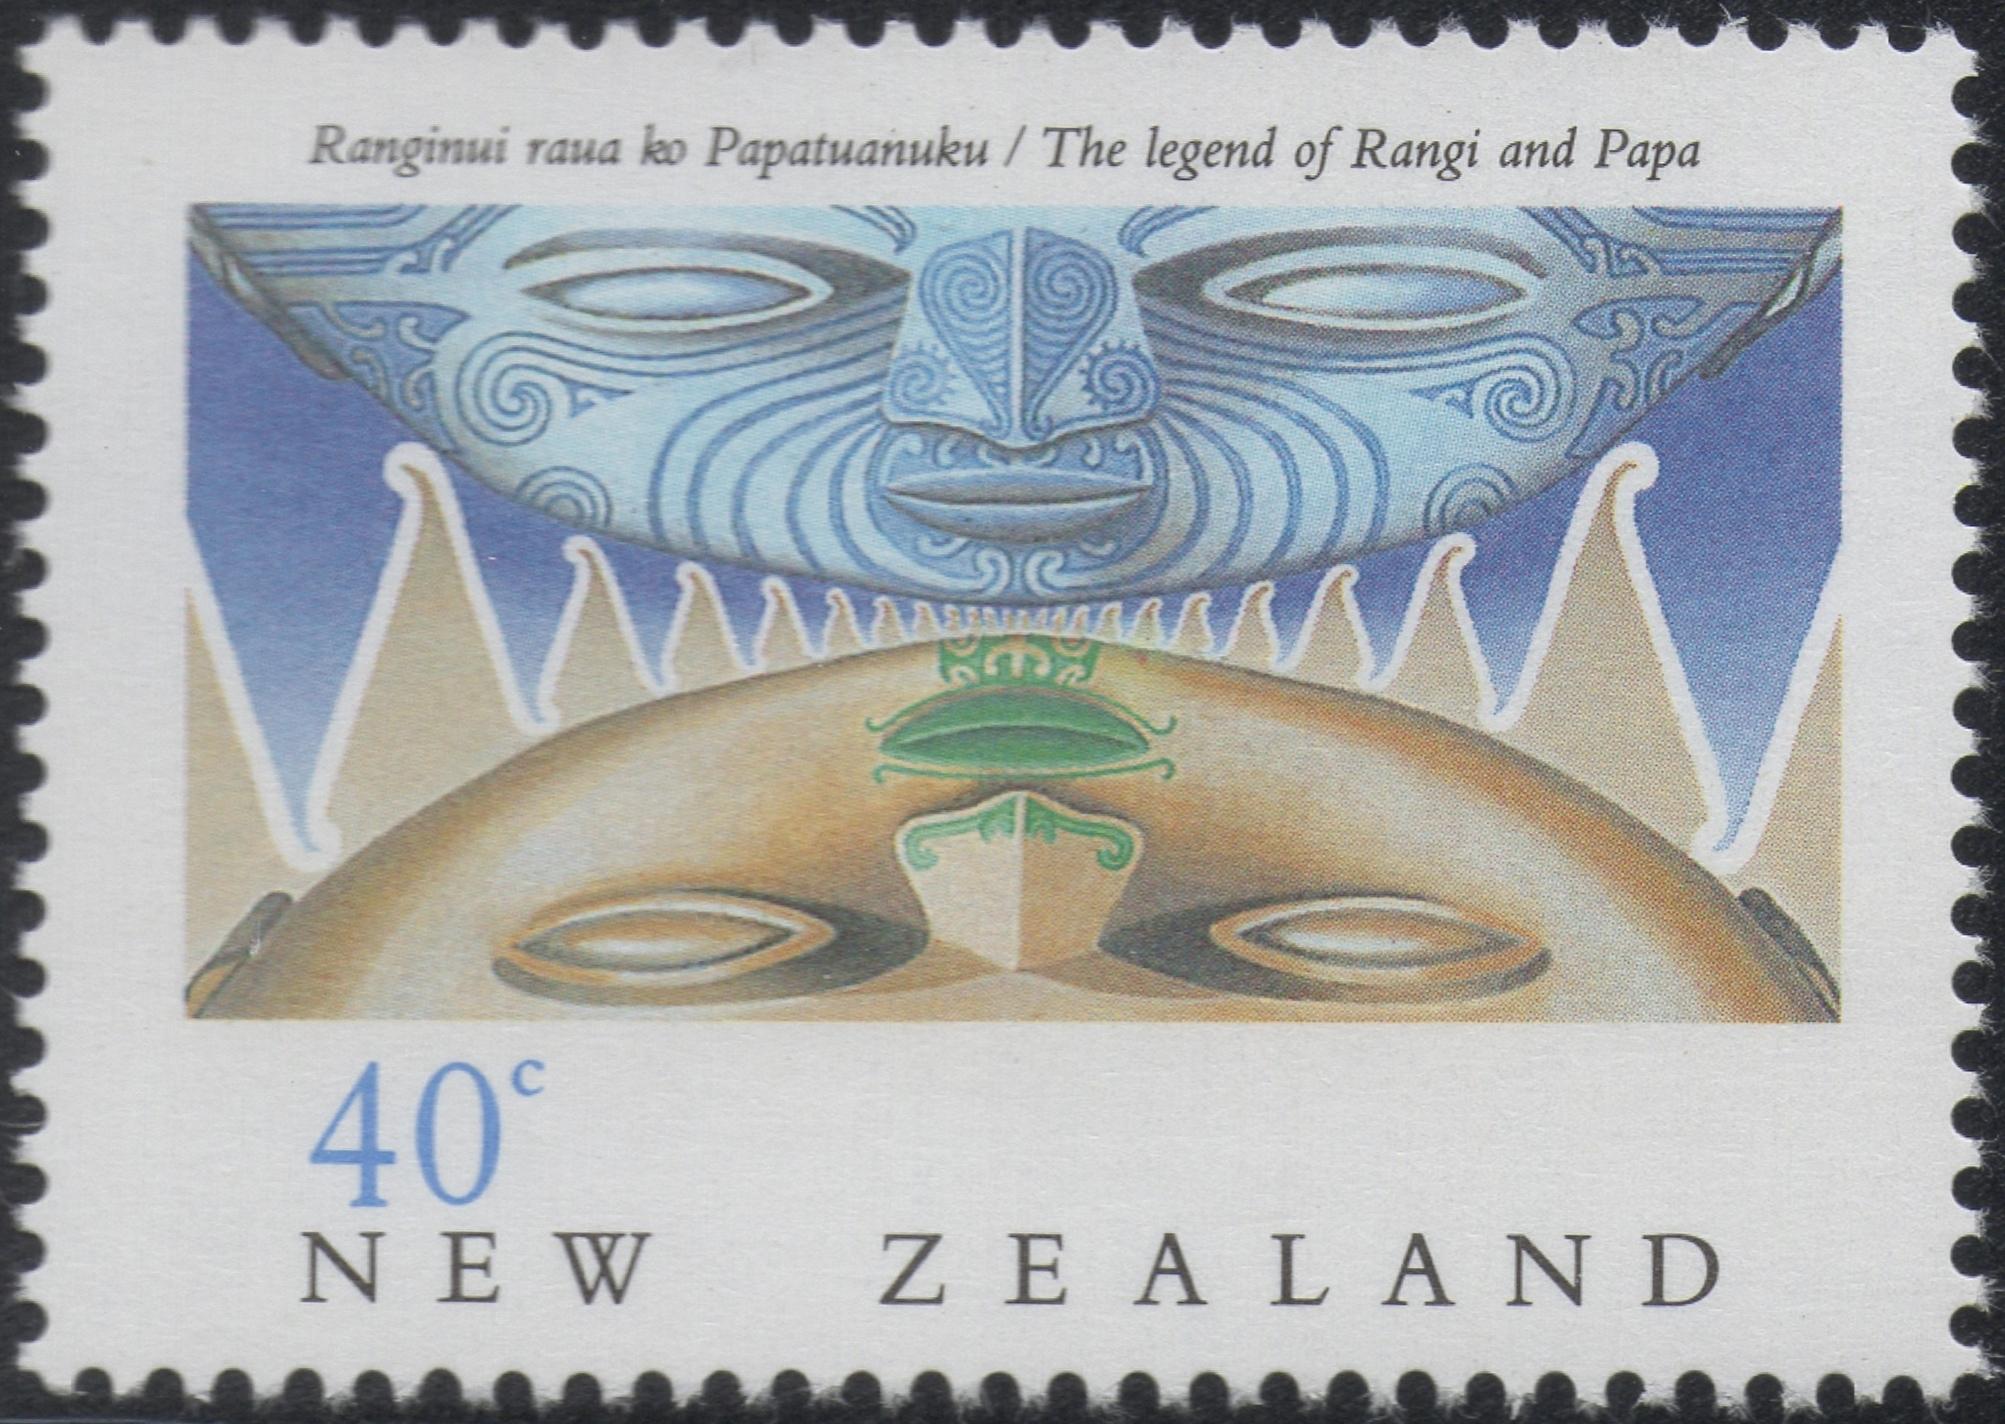 New Zealand - Scott #997 (1990)